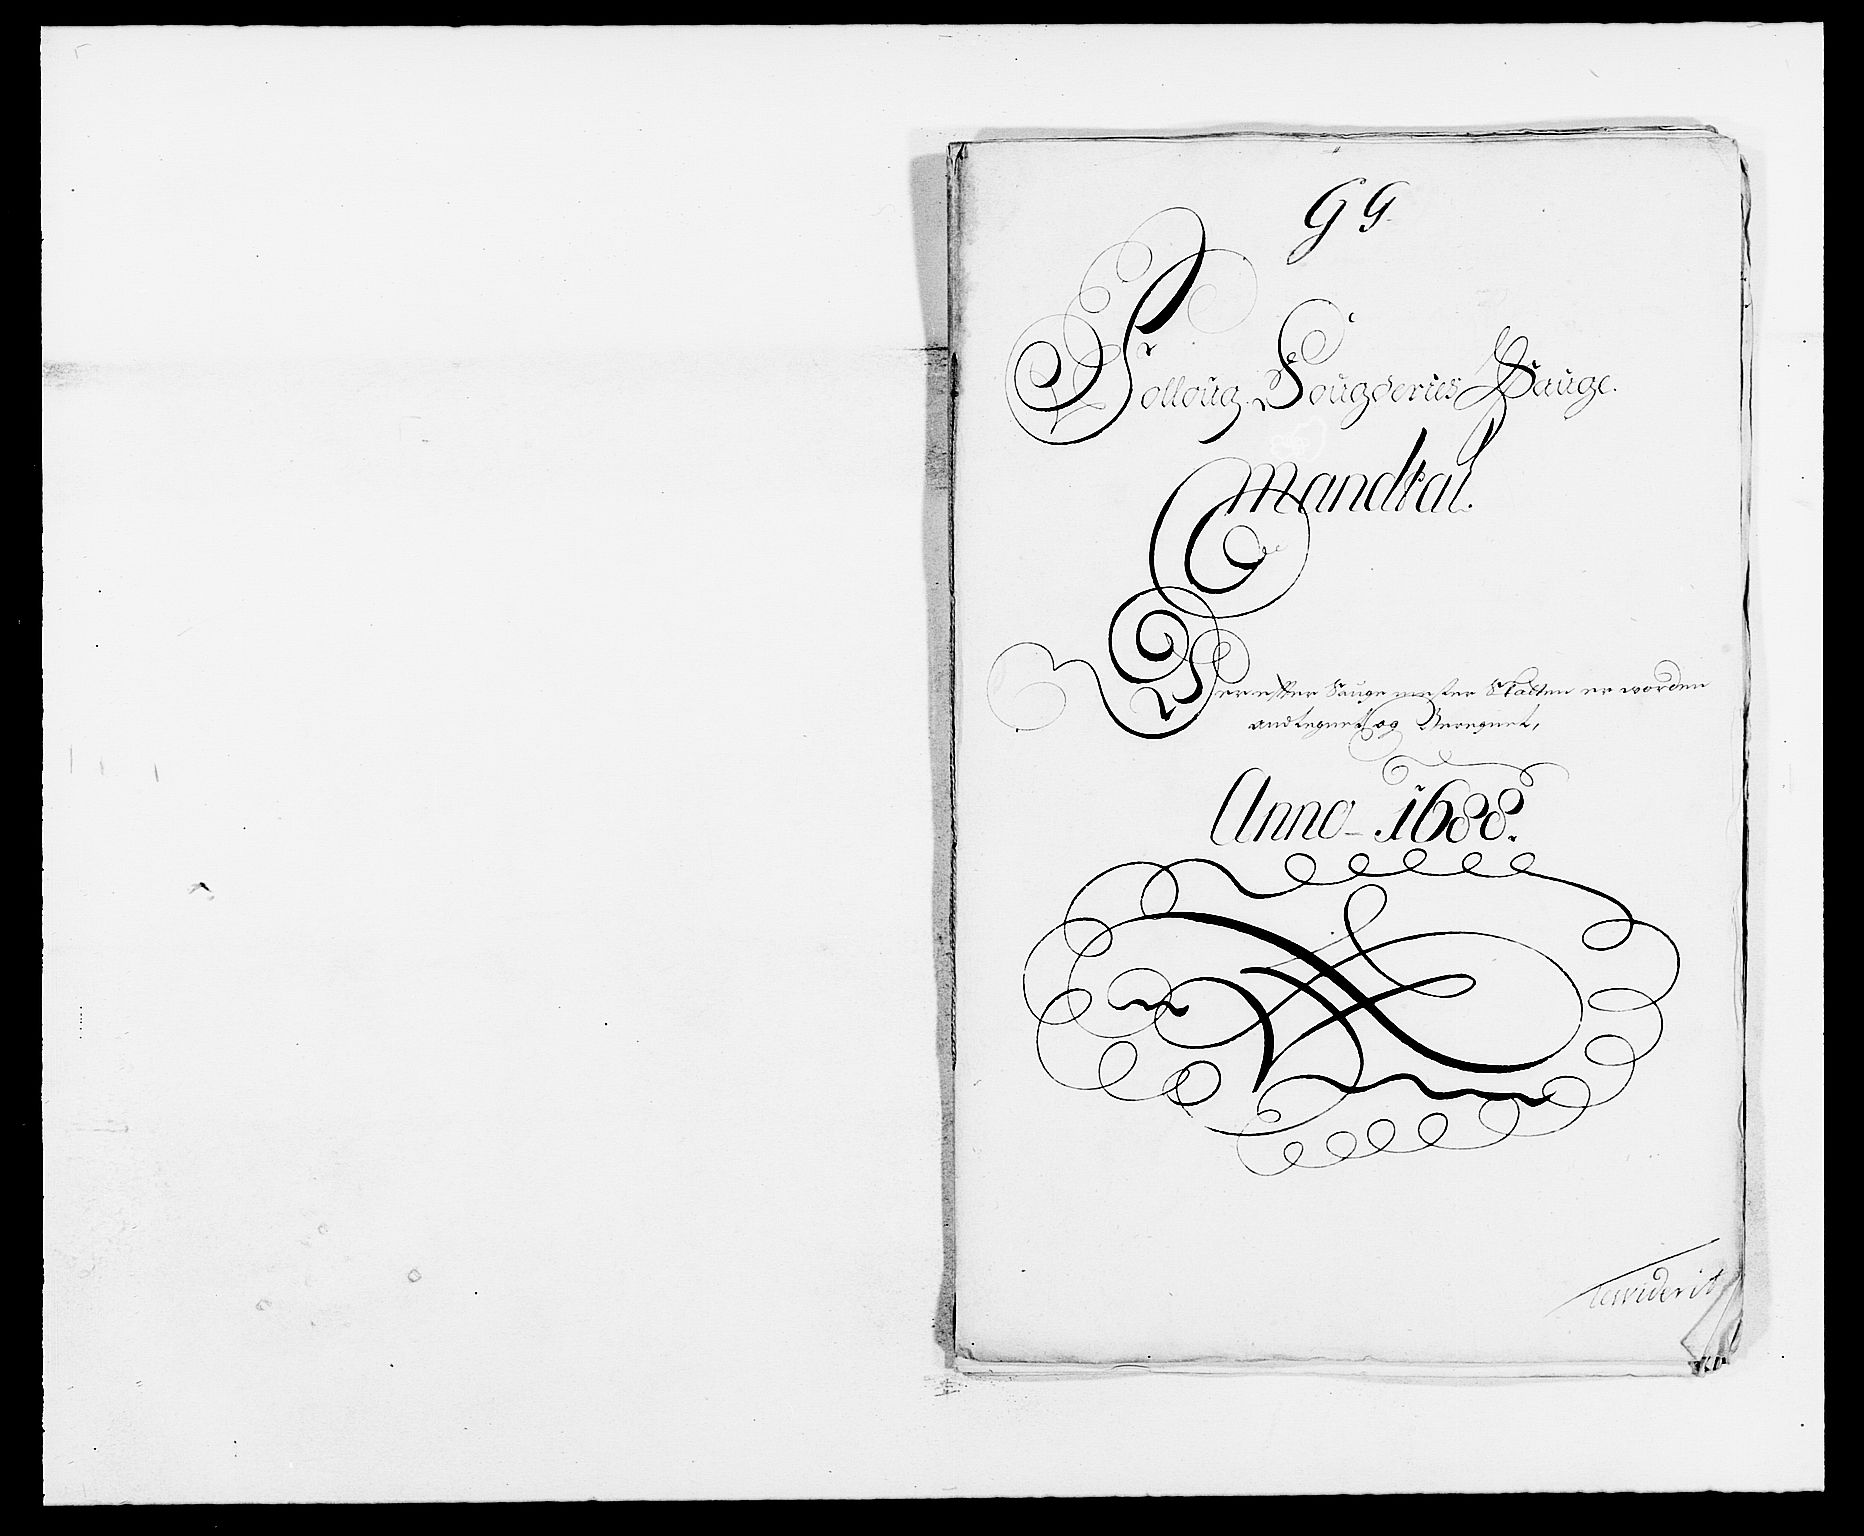 RA, Rentekammeret inntil 1814, Reviderte regnskaper, Fogderegnskap, R09/L0434: Fogderegnskap Follo, 1687-1688, s. 353